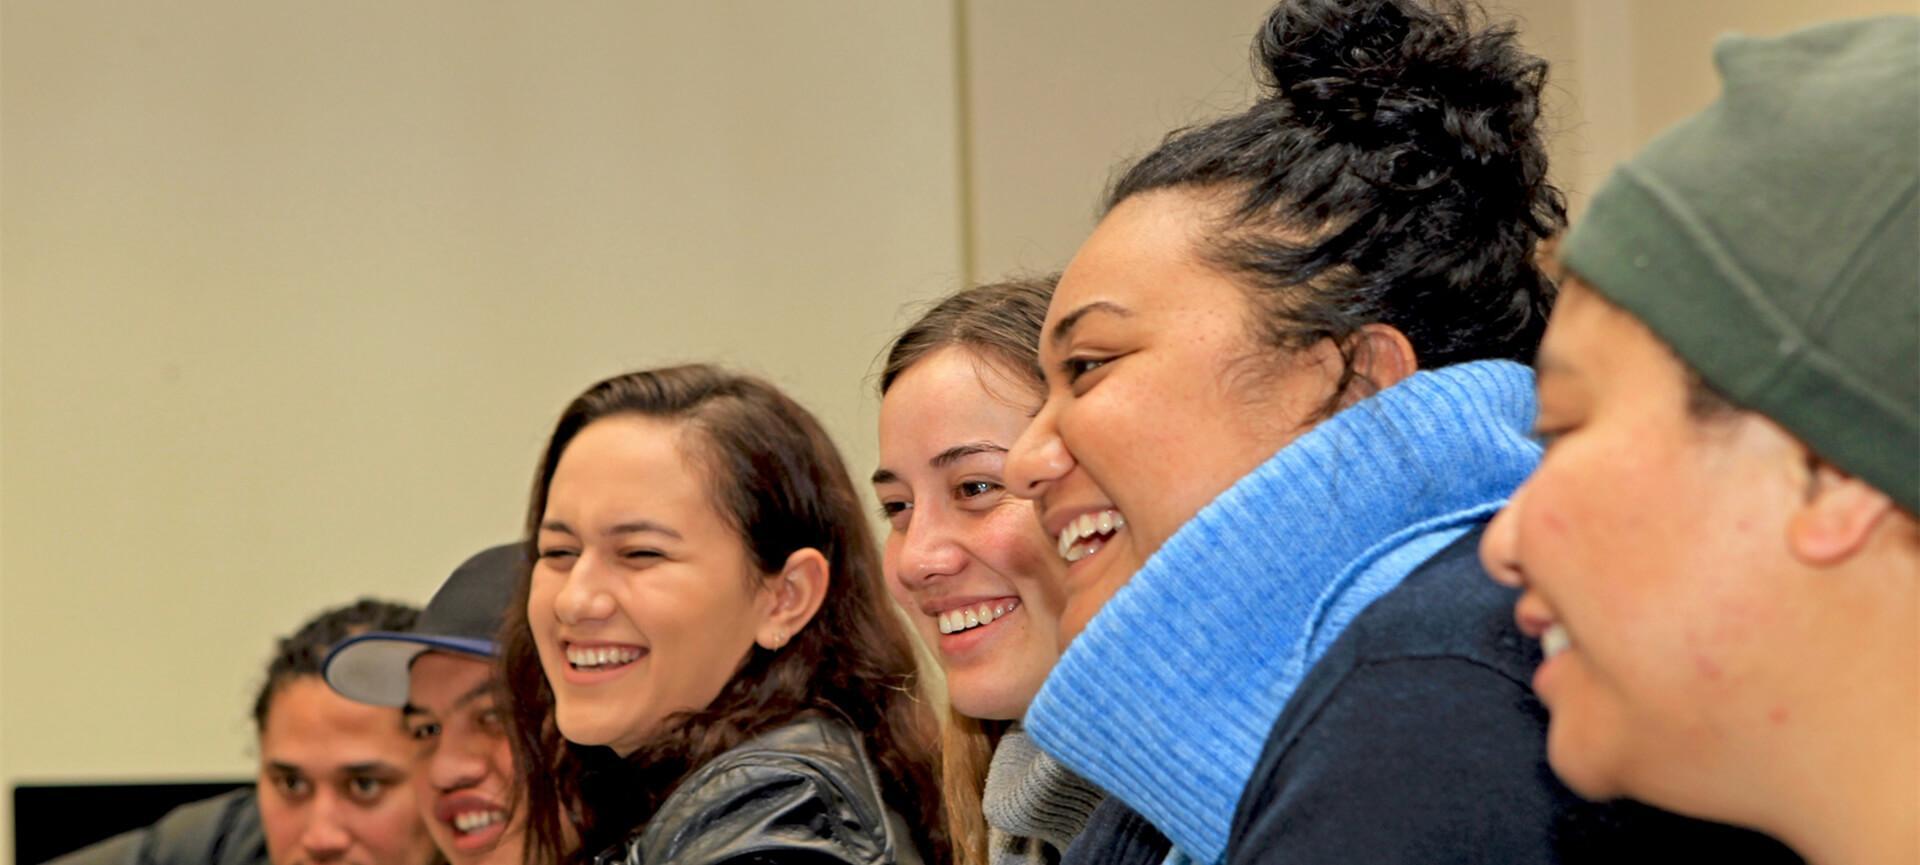 Young Maori people smiling